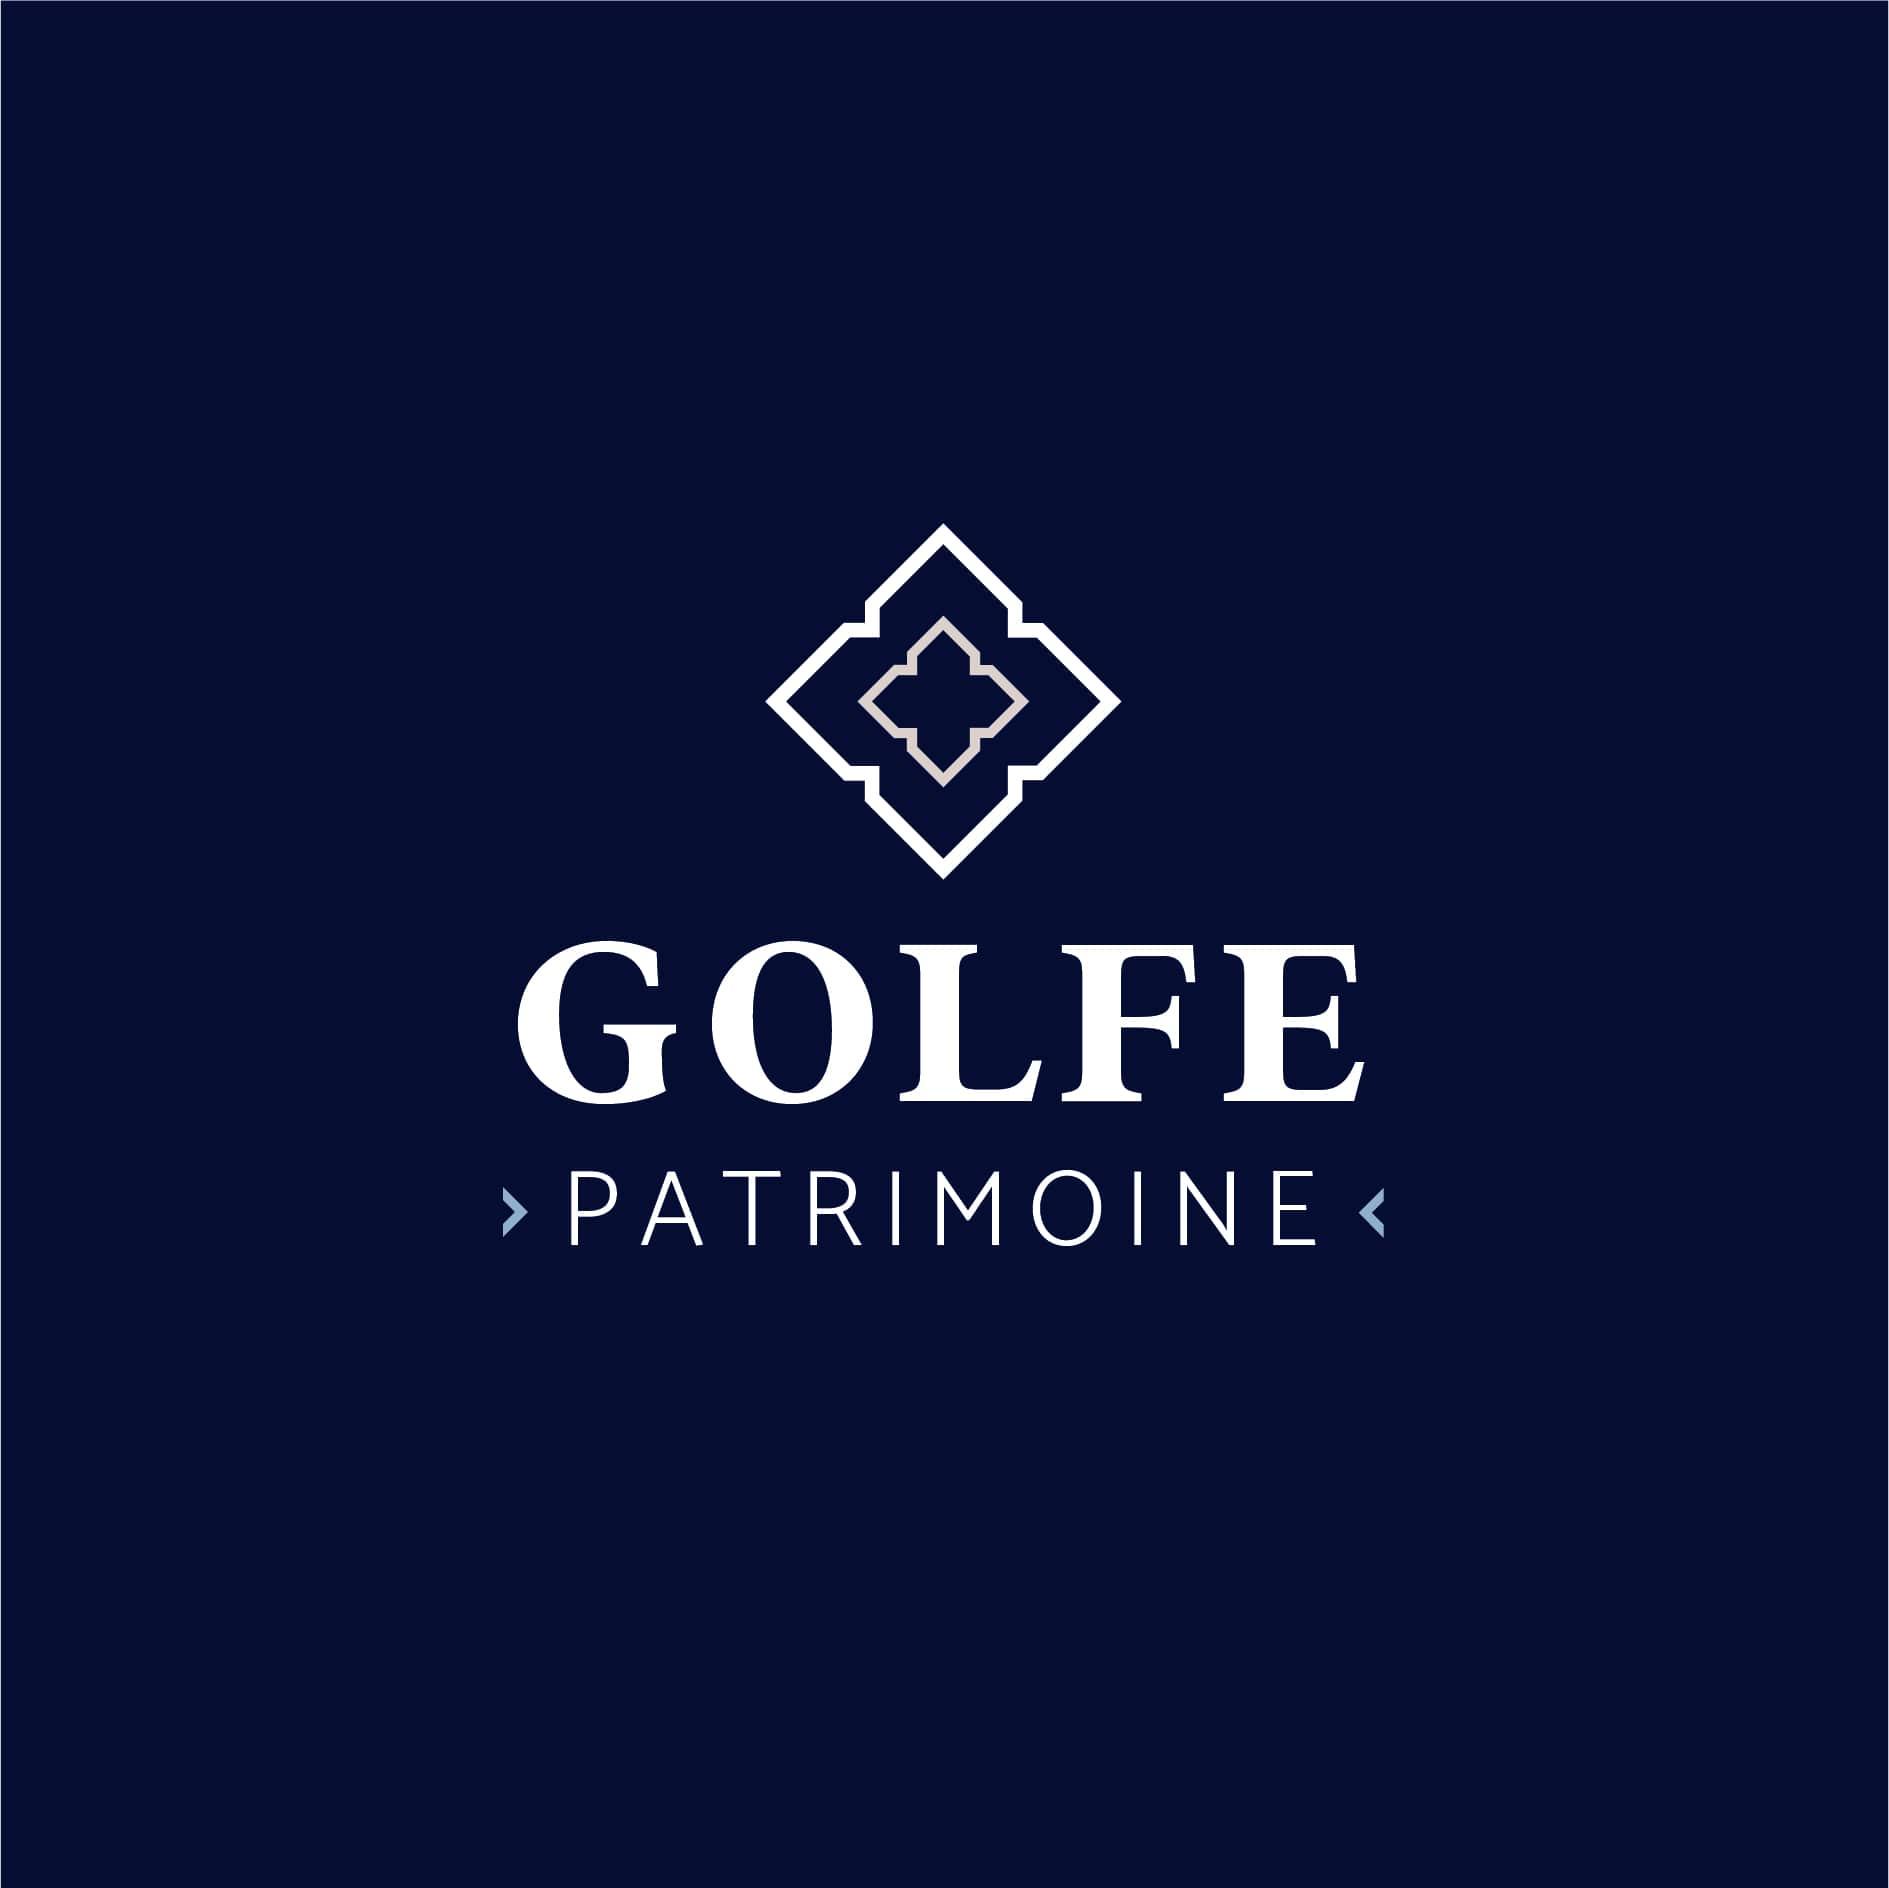 Golfe Patrimoine